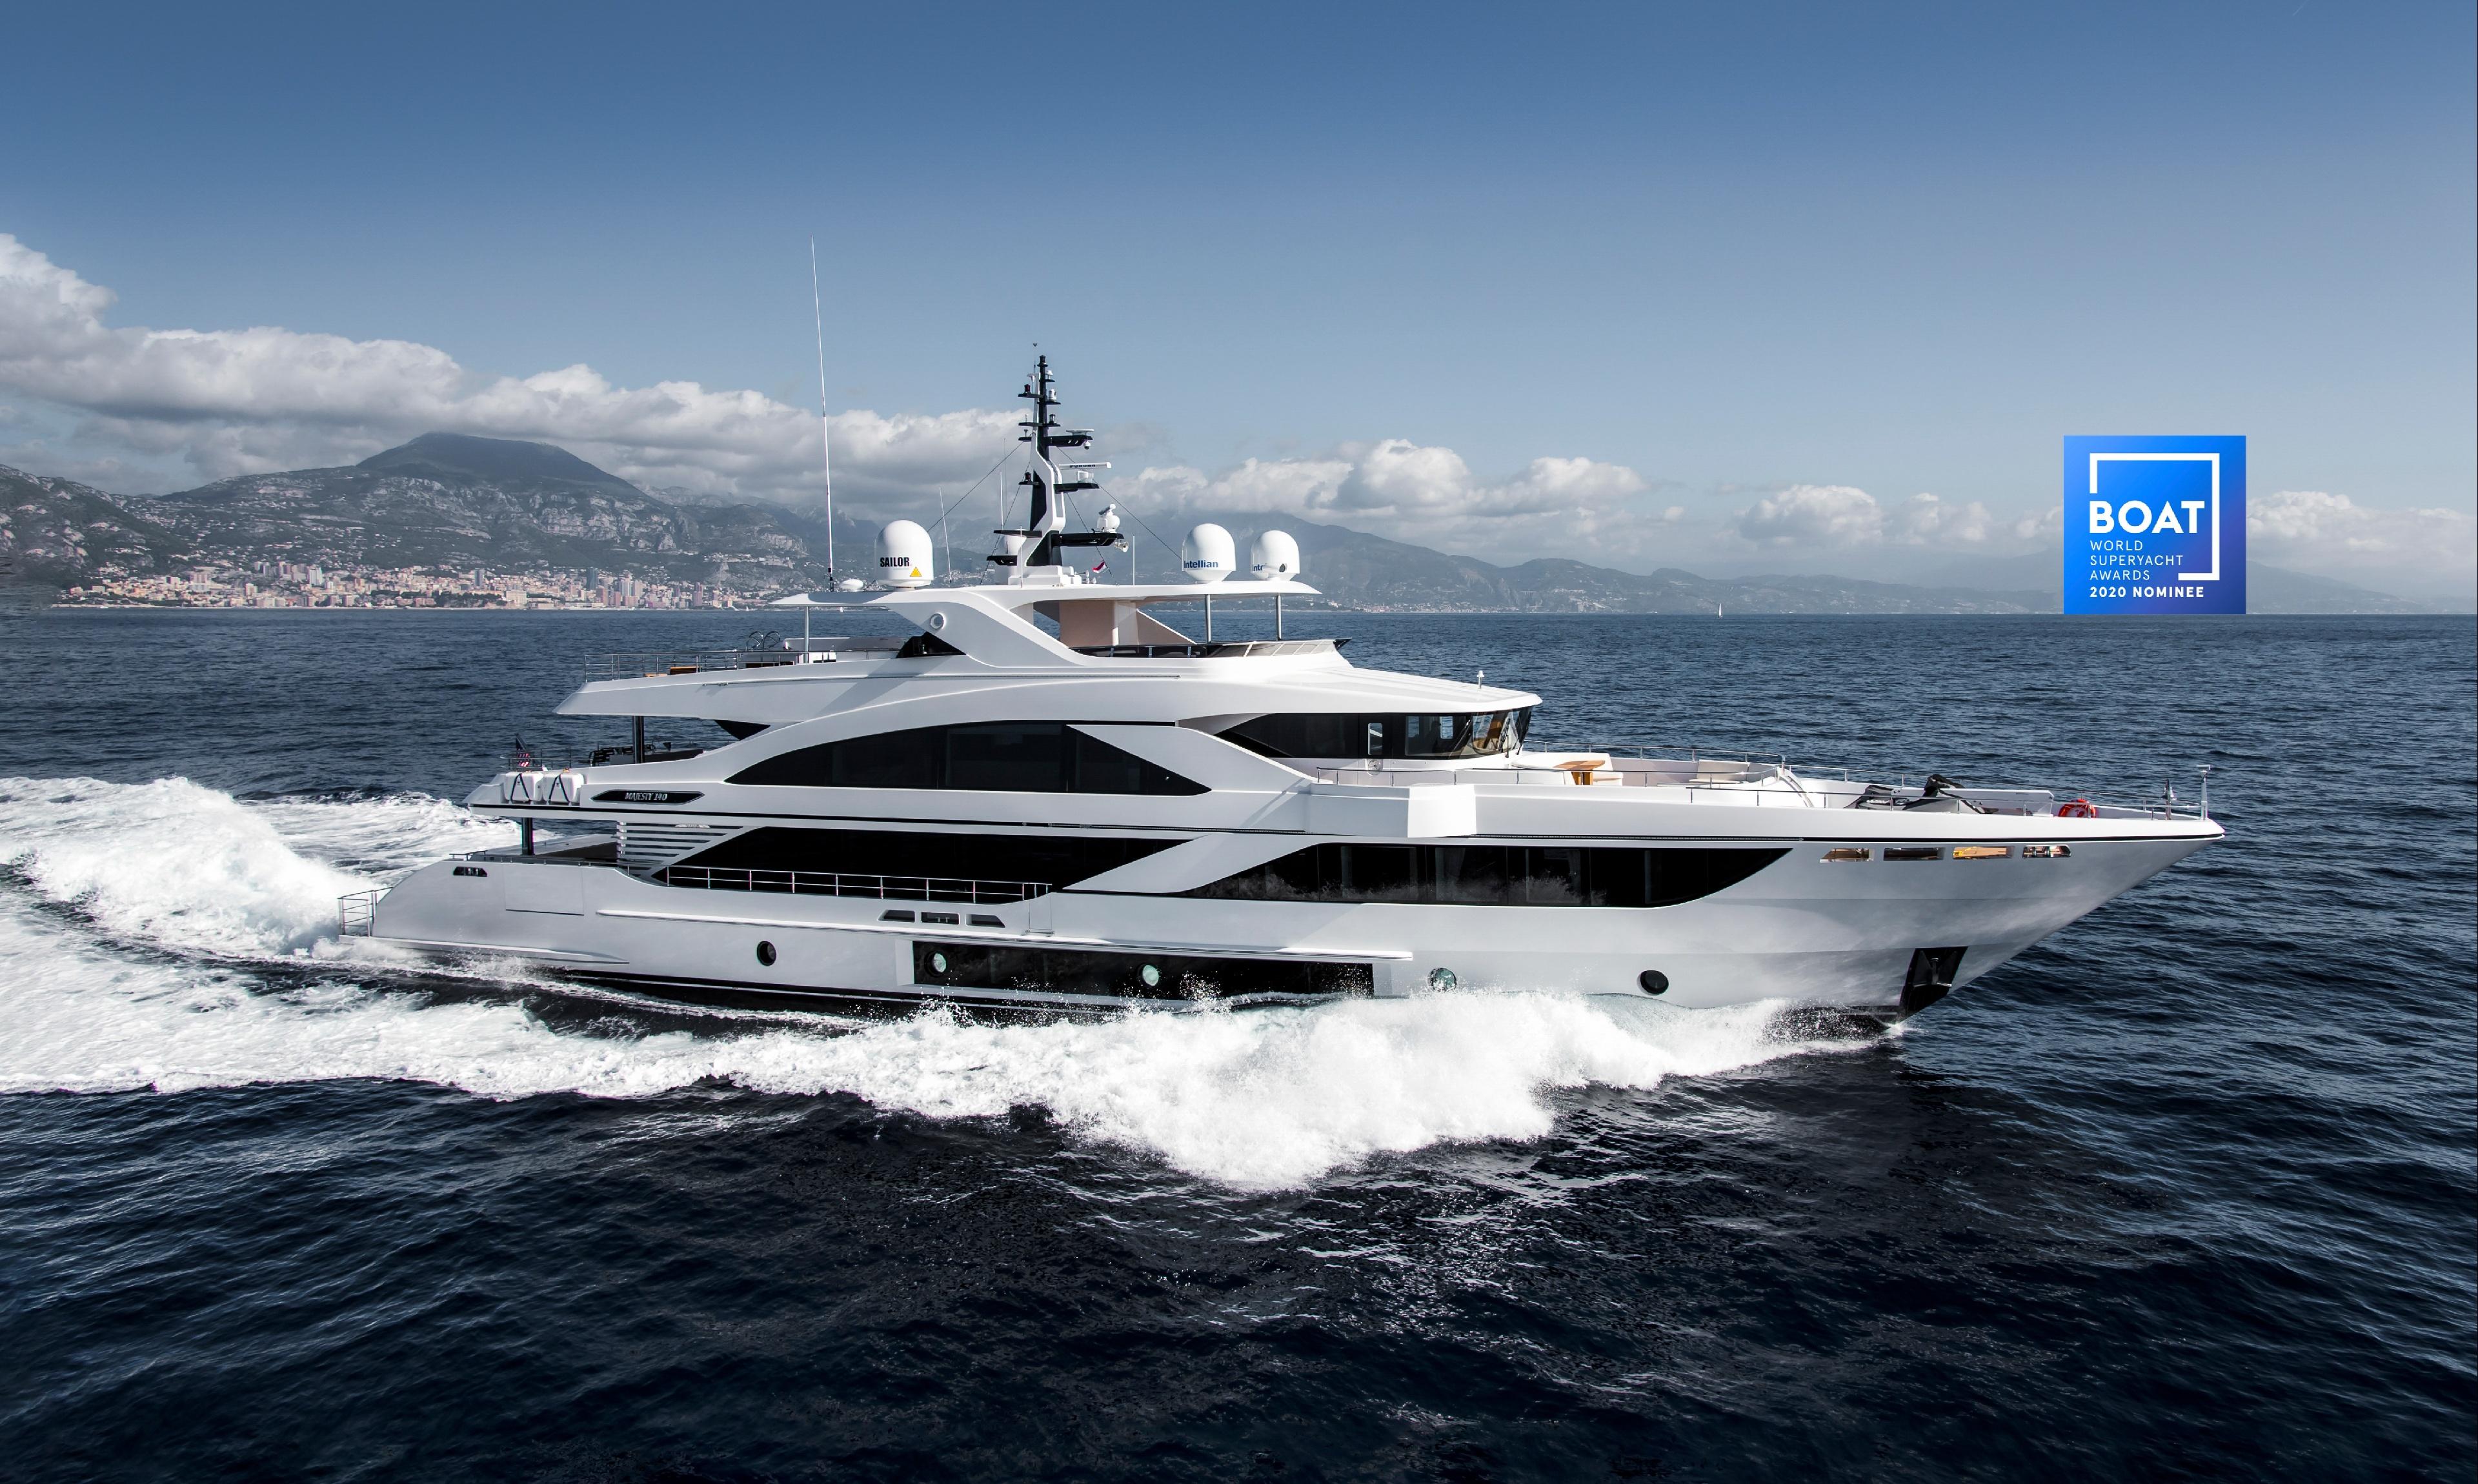 Aurora Premium Boat Shine  Once a year boat polish